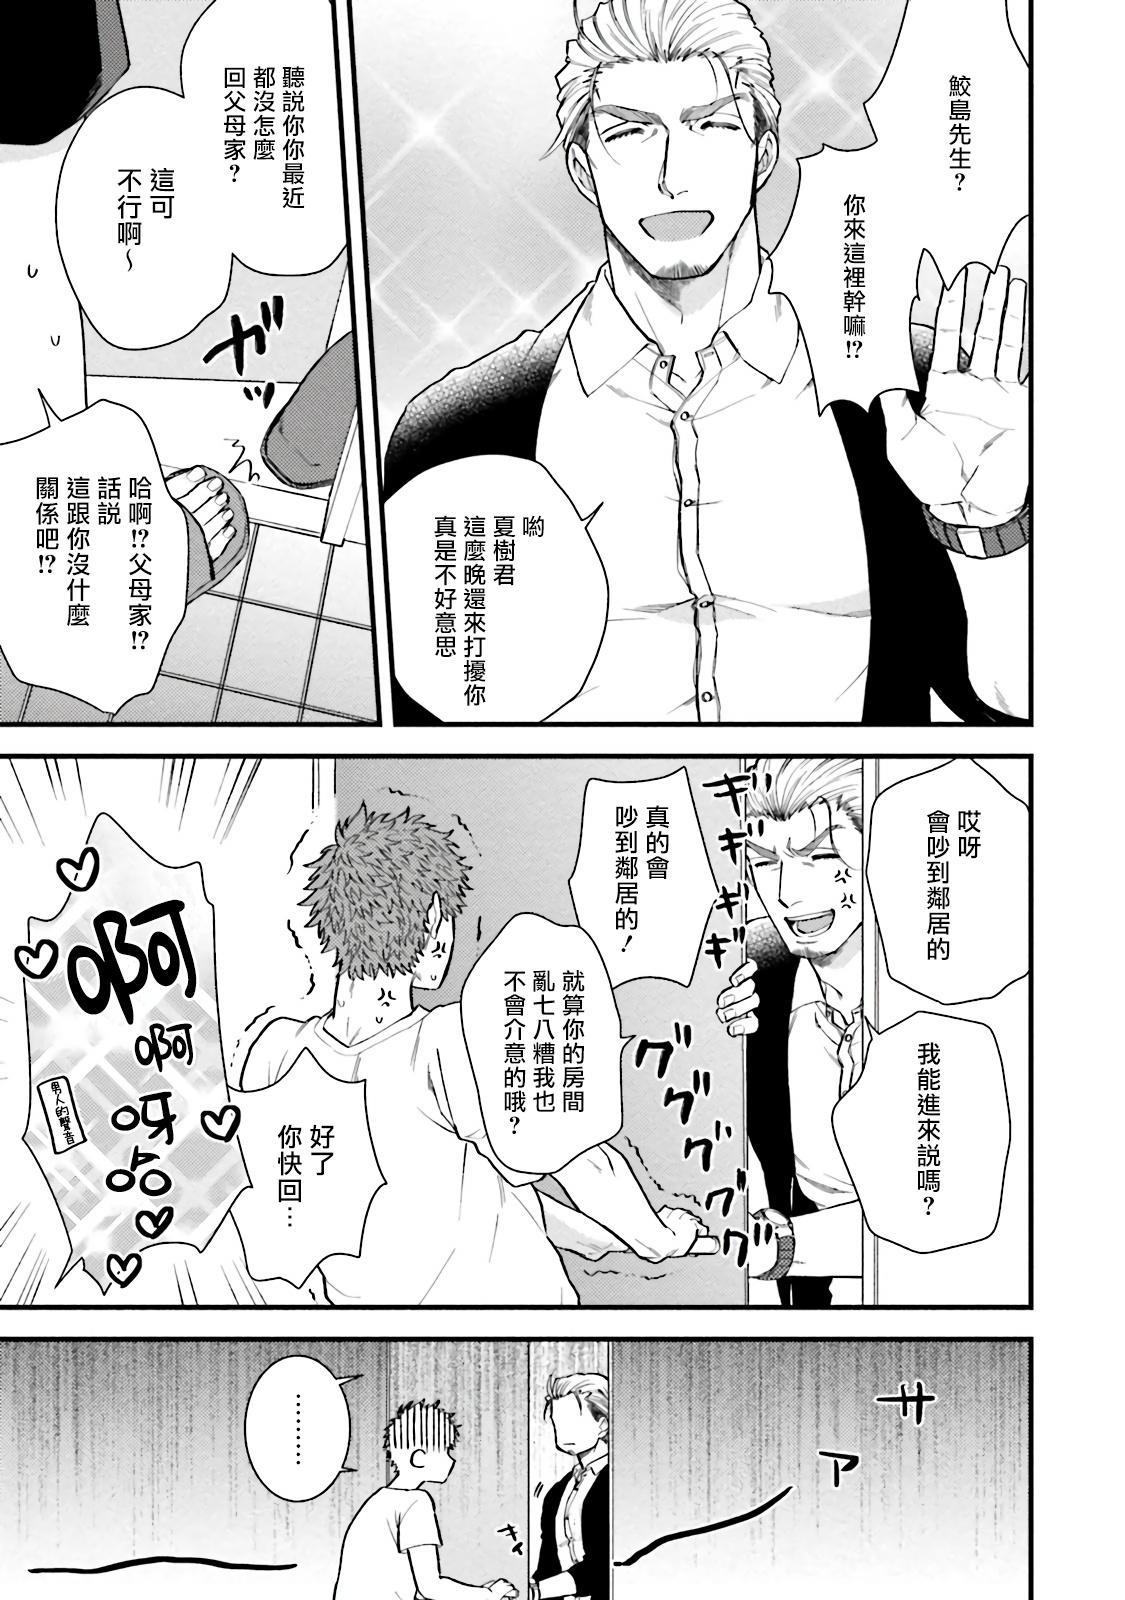 Kinou wa Otanoshimi Deshita ne | 昨天过得很愉快吧 Ch. 1-4+特典 65